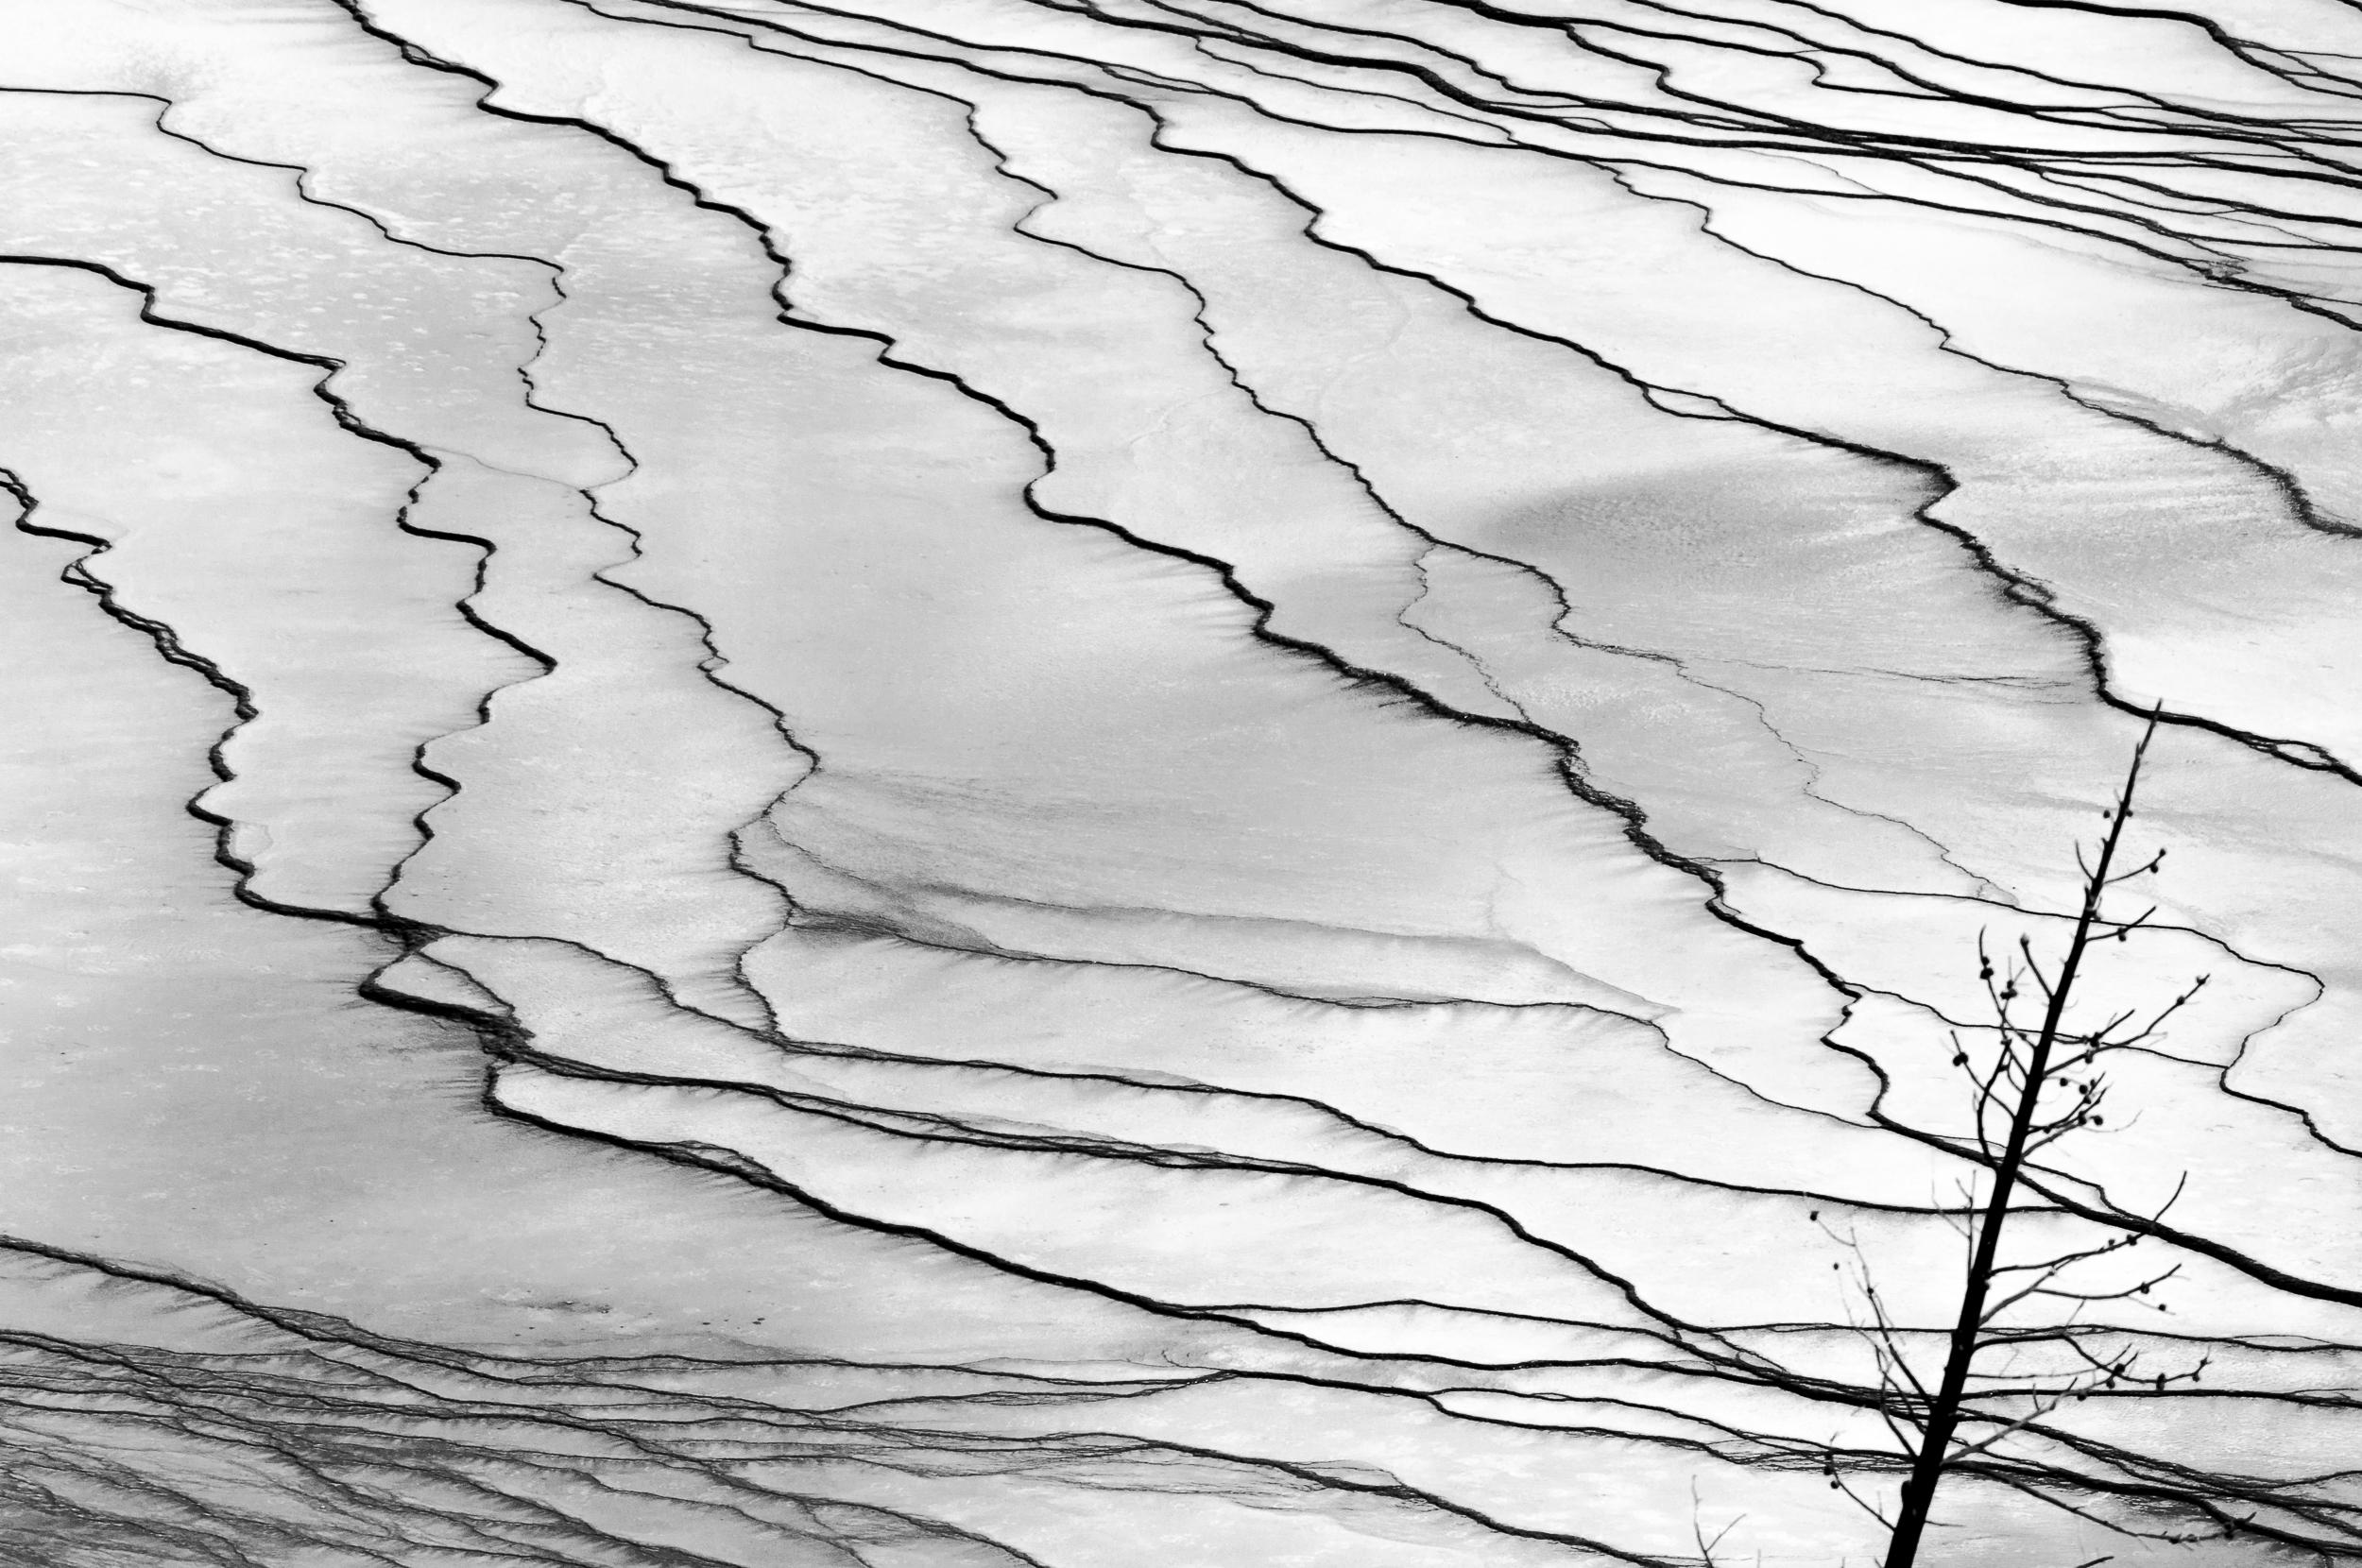 7-TerraceGeometry.jpg